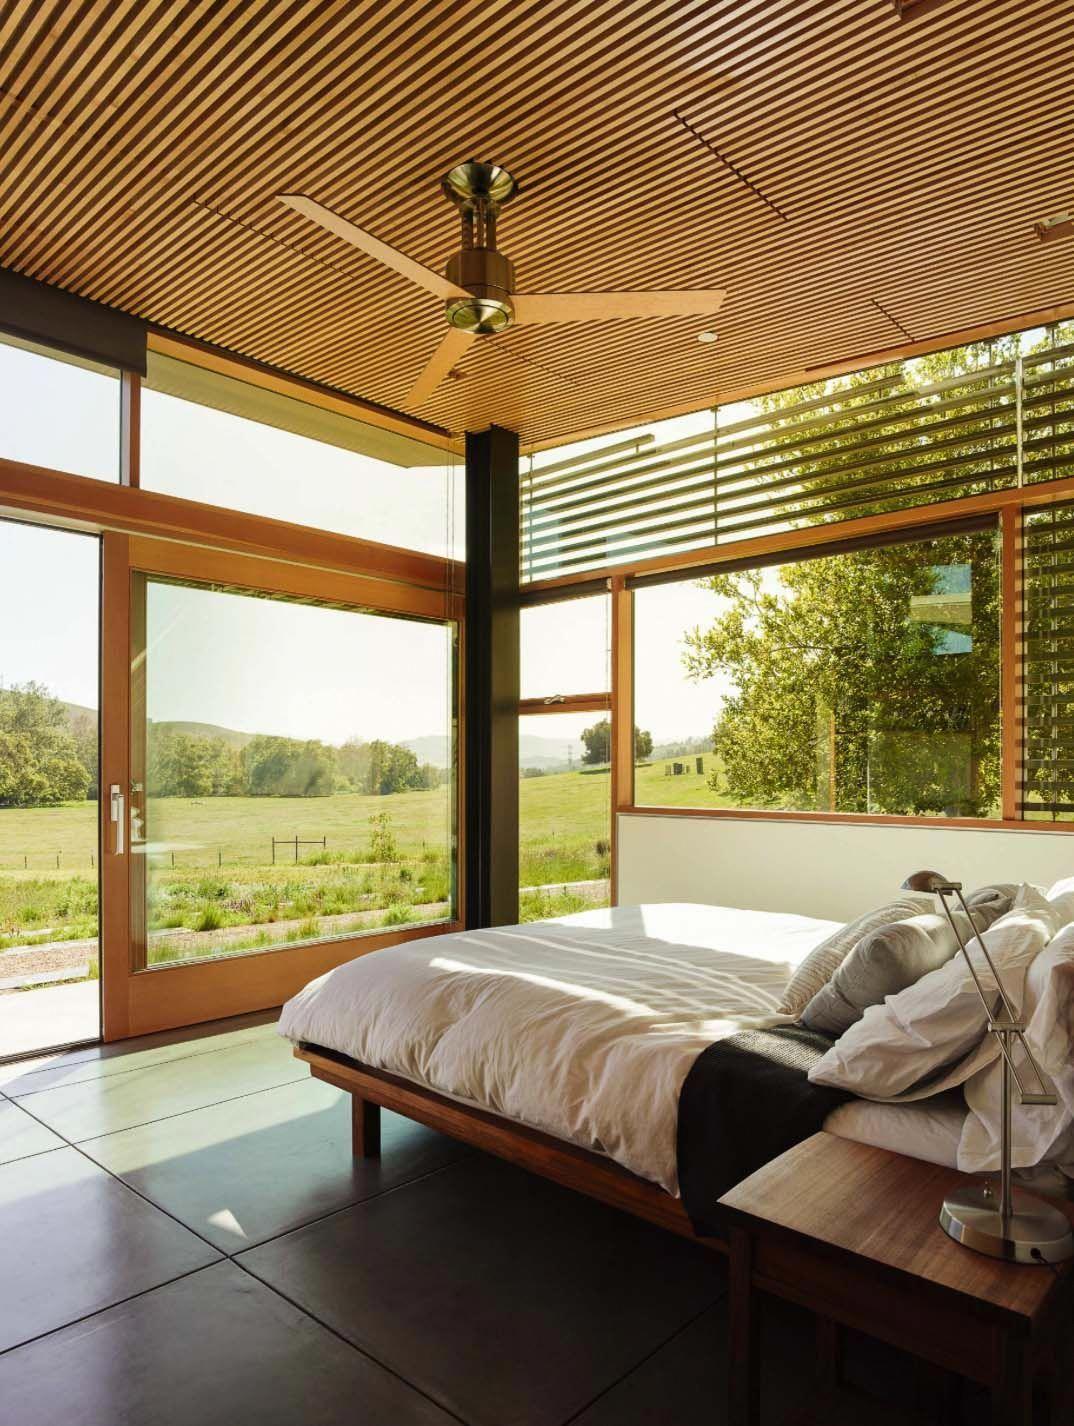 Best interior design programs interiorwalldesign citationxinterior also rh pinterest